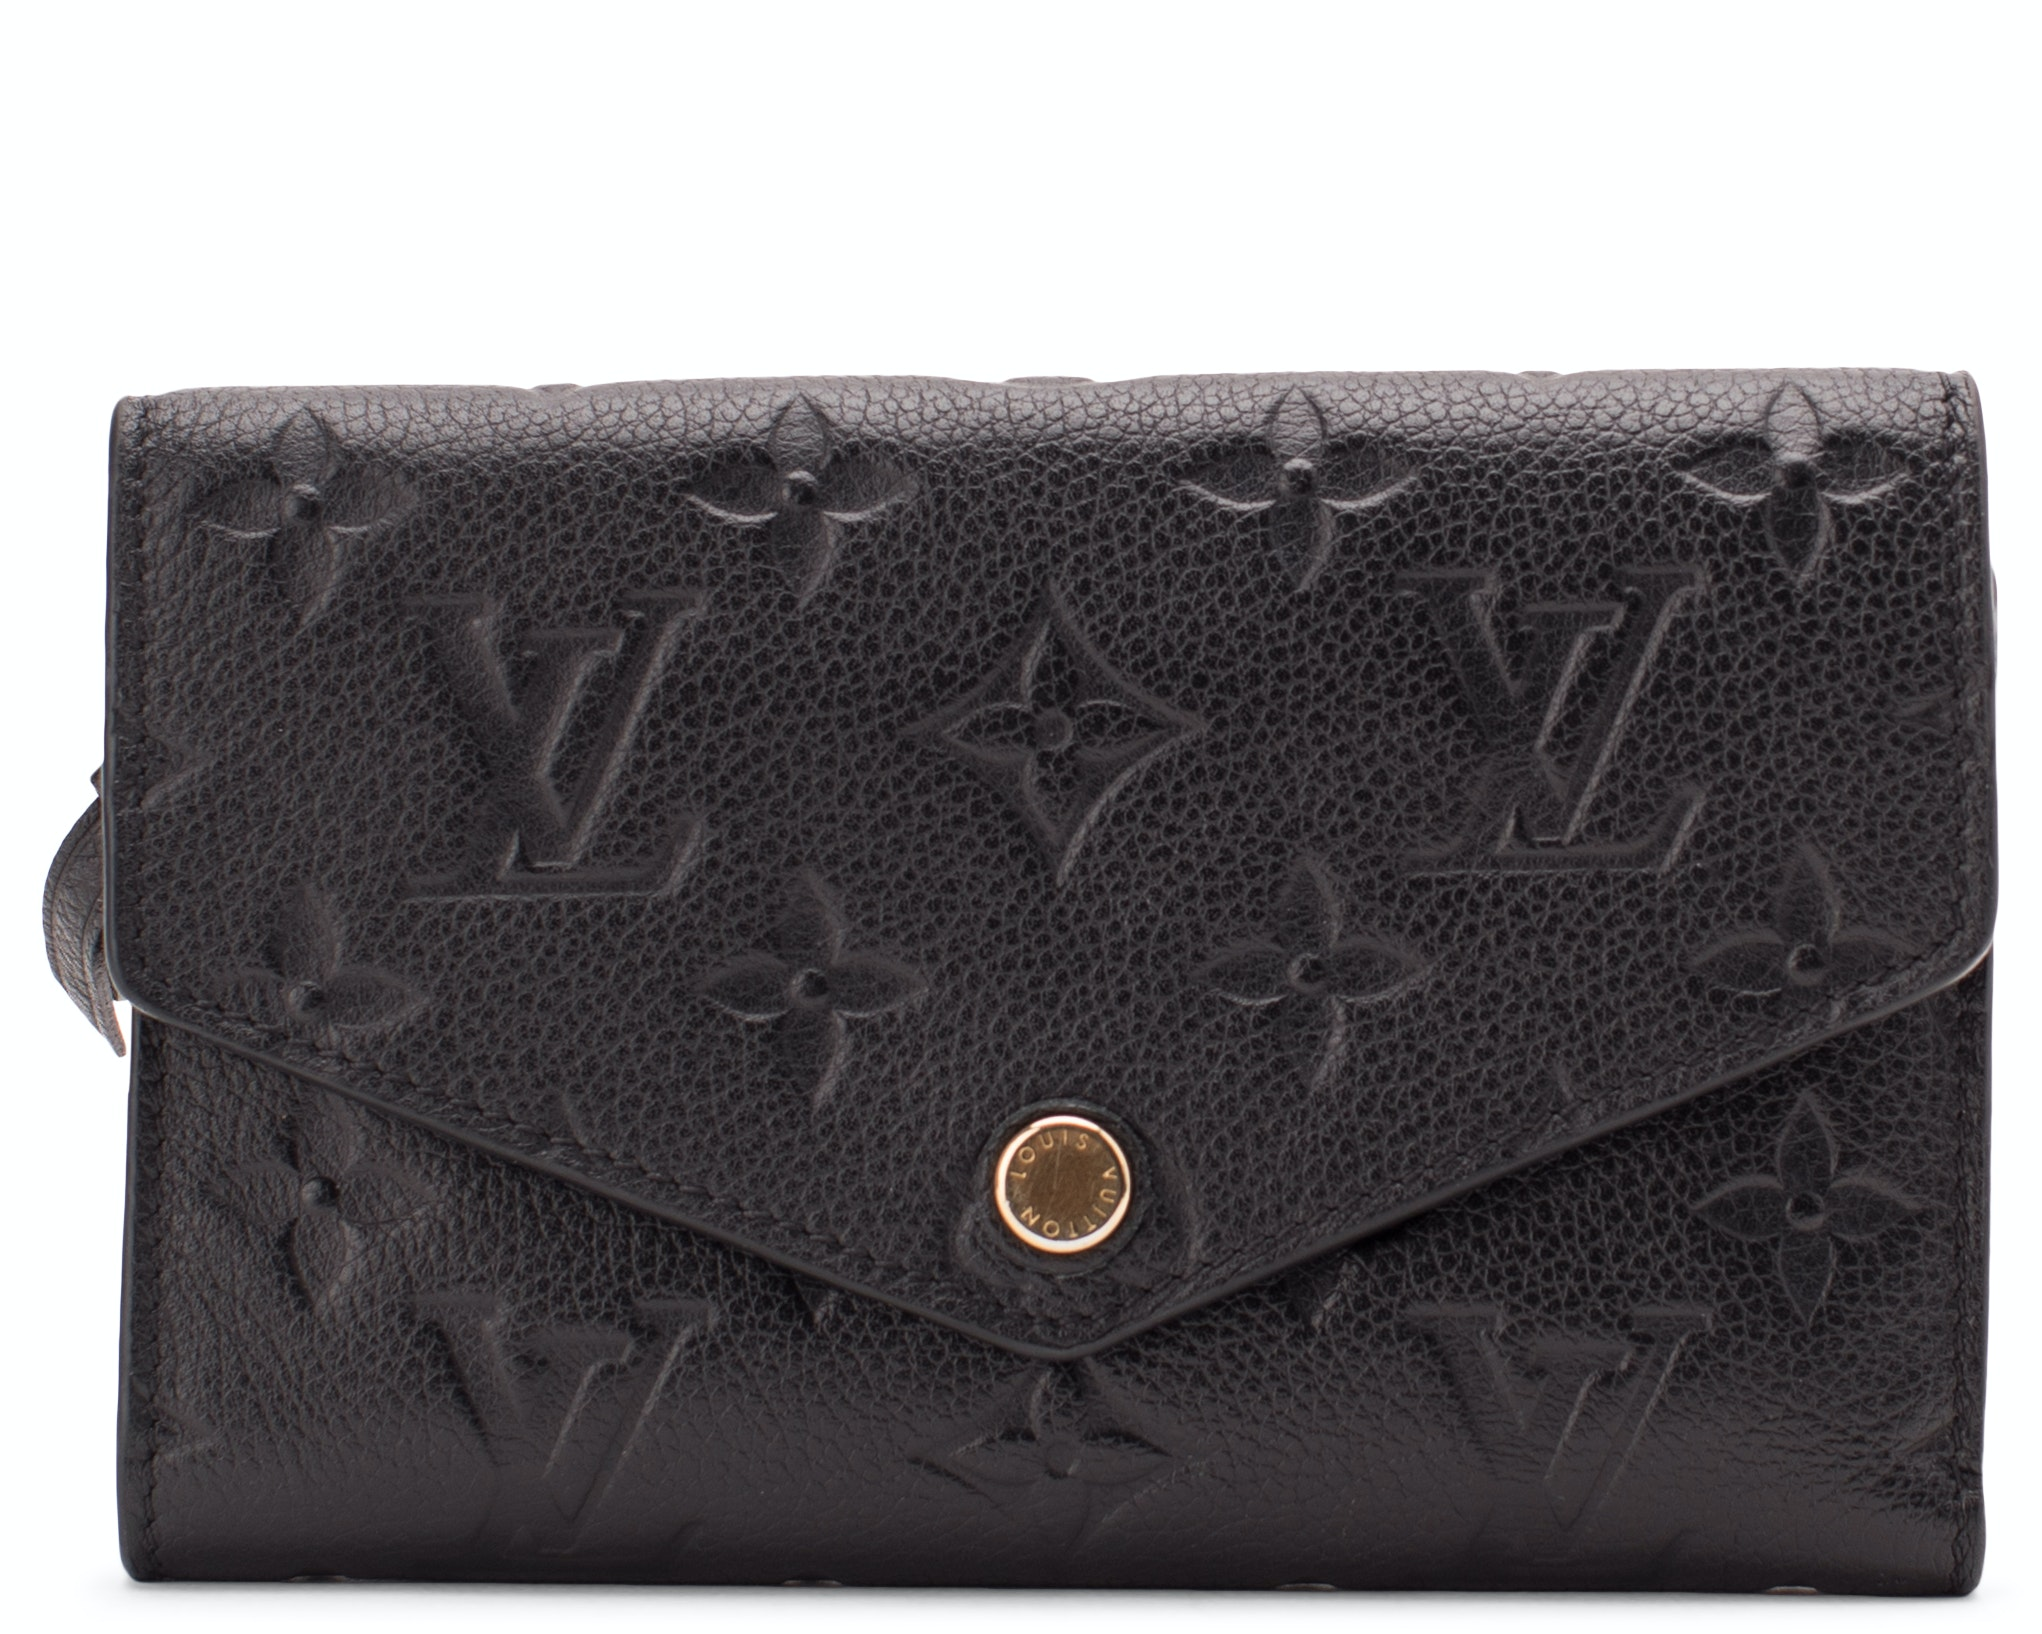 Louis Vuitton Wallet Compact Curieuse Monogram Empreinte